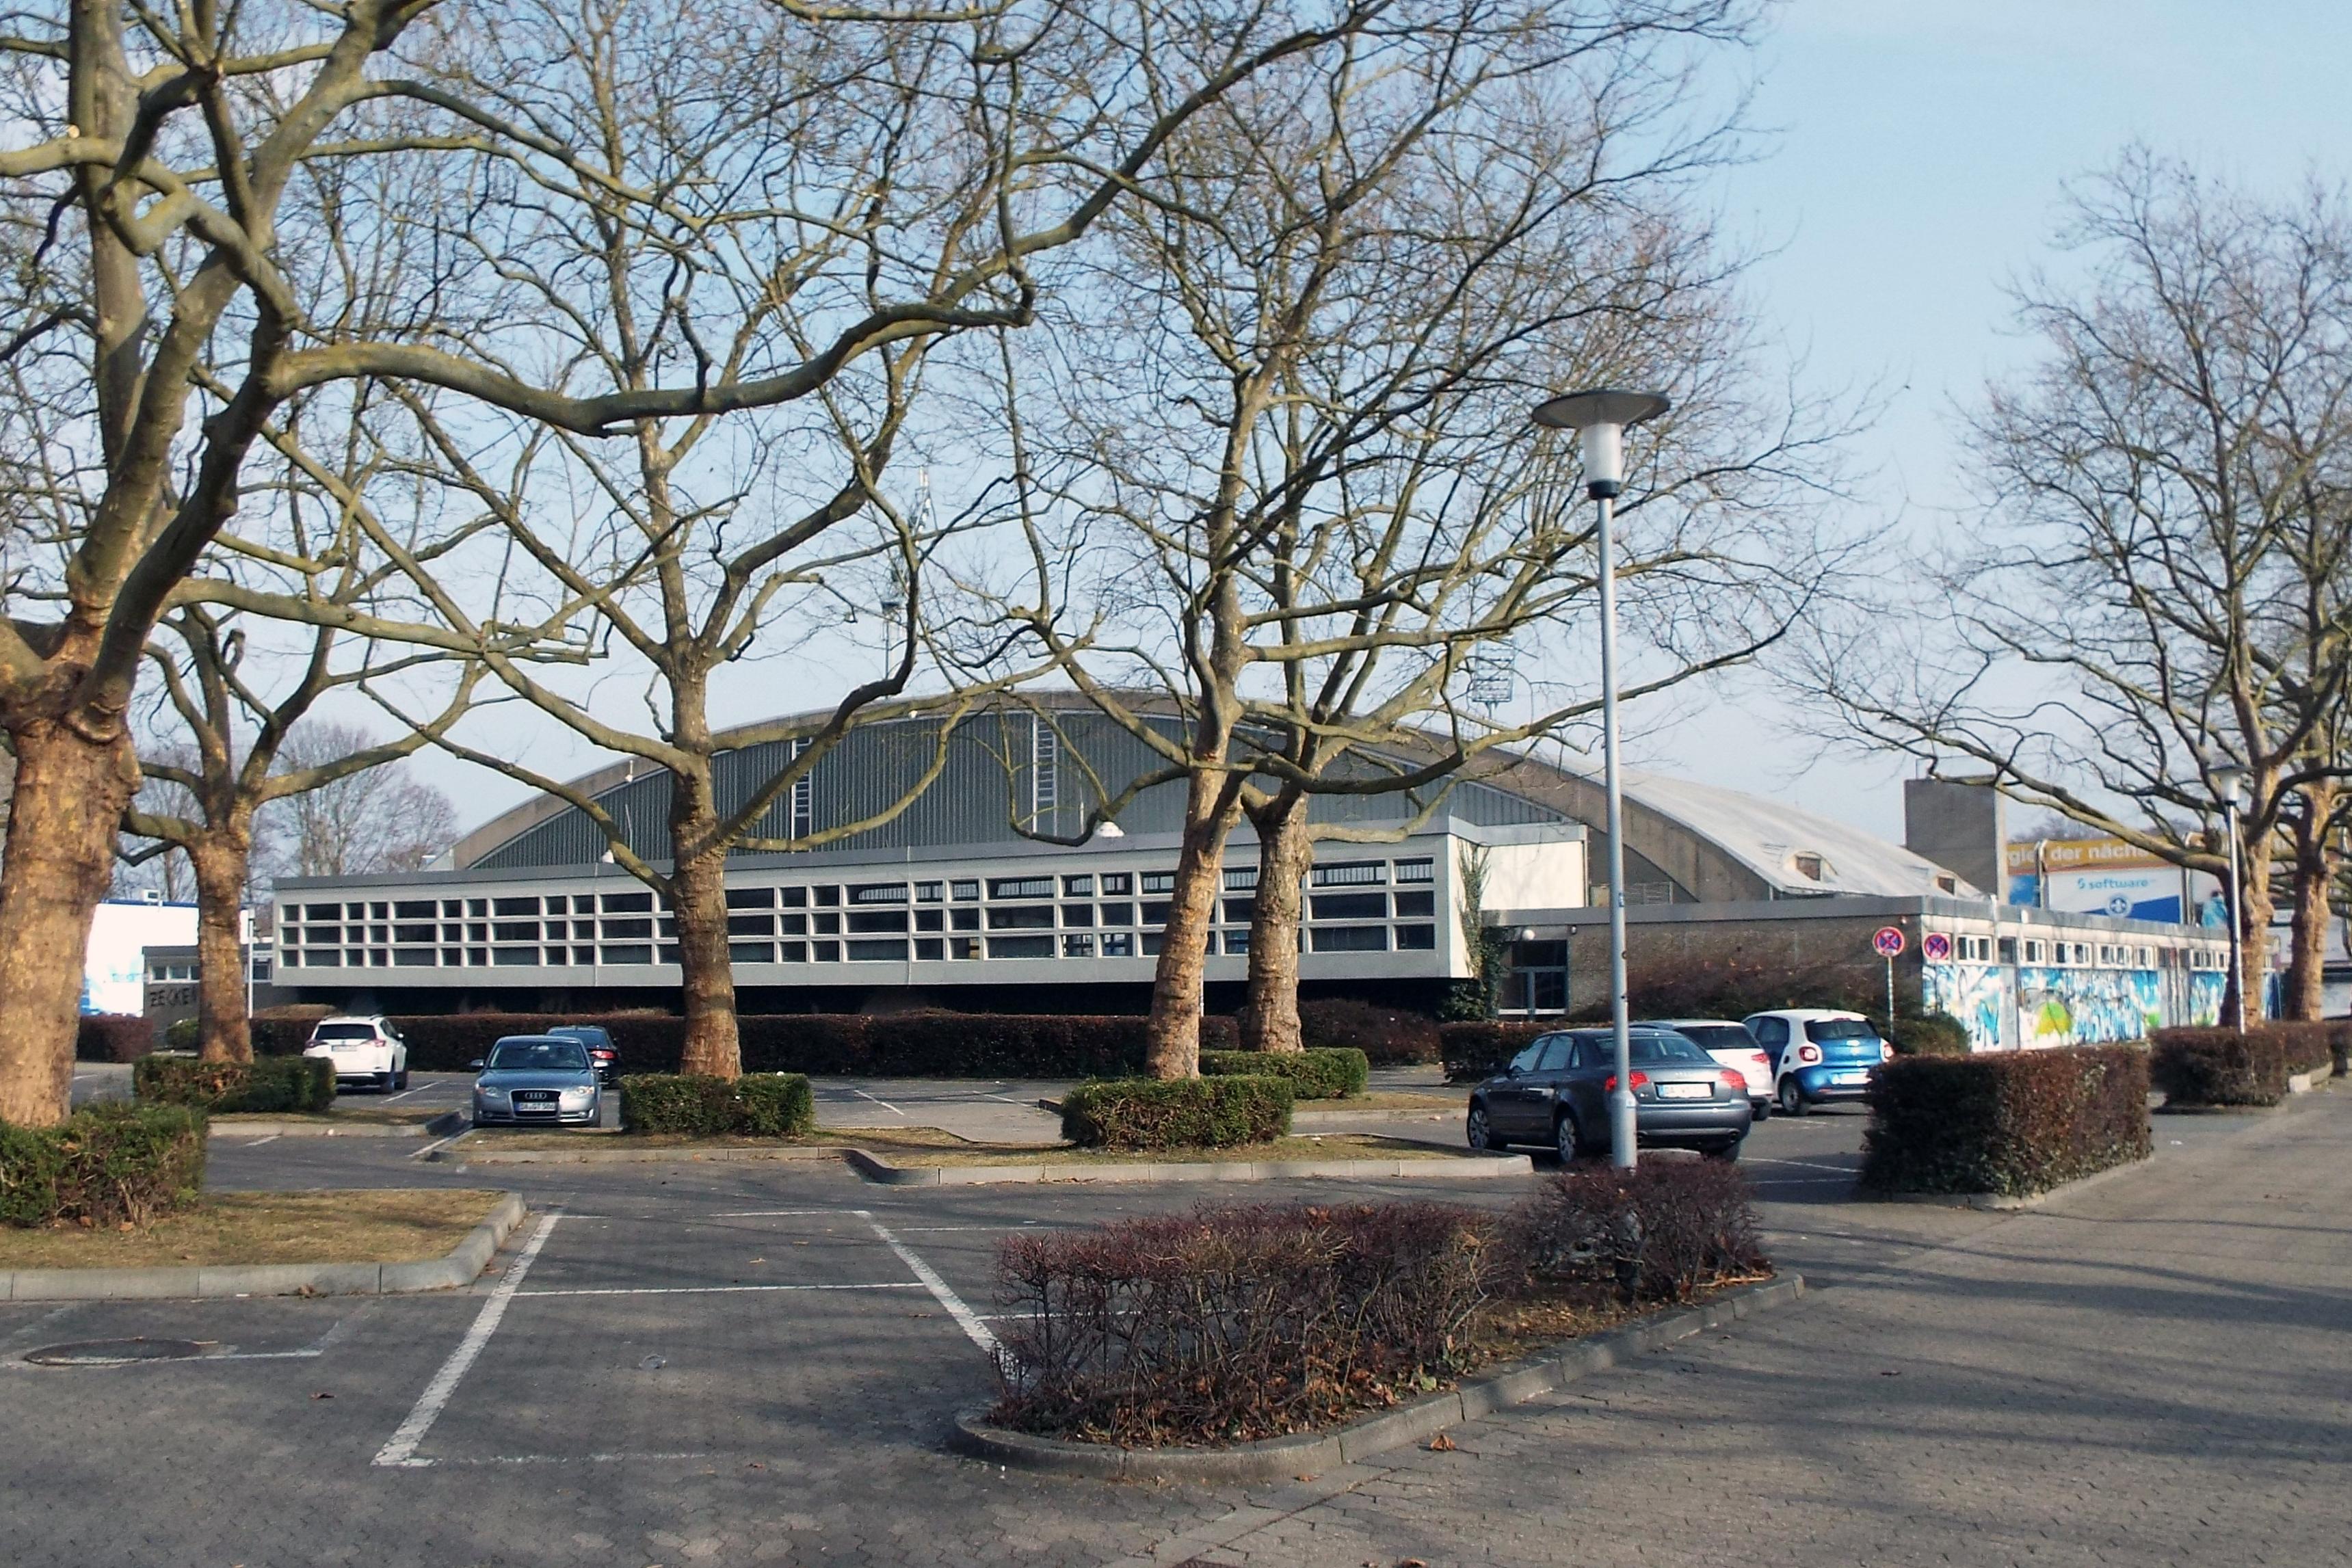 Sporthalle am Böllenfalltor – Wikipedia